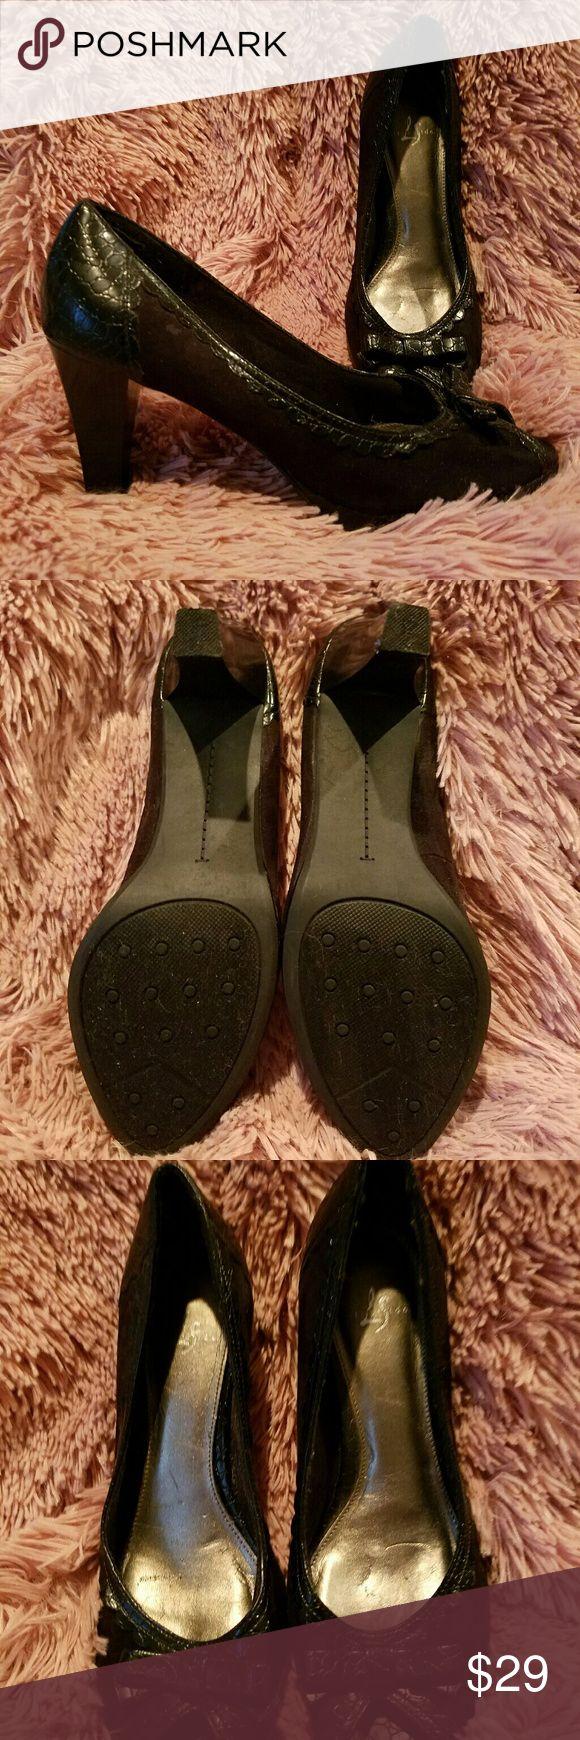 PRICE DROP!!  Peep toe pumps Black peep toe pumps.  Excellent condition. Life Stride Shoes Heels